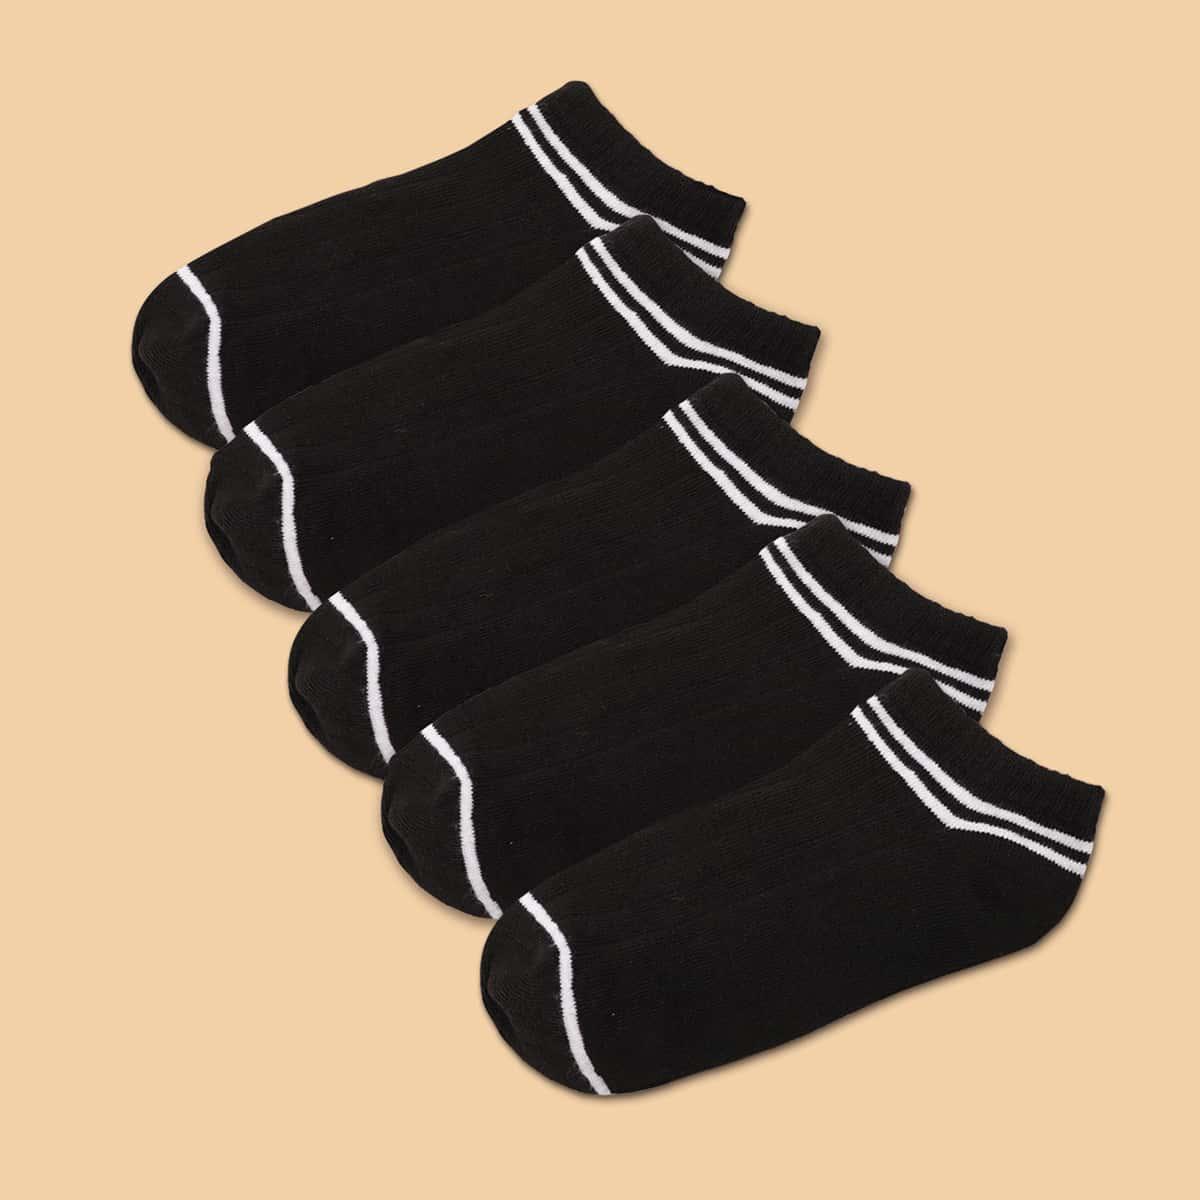 5 пар носки с полосатым узором фото